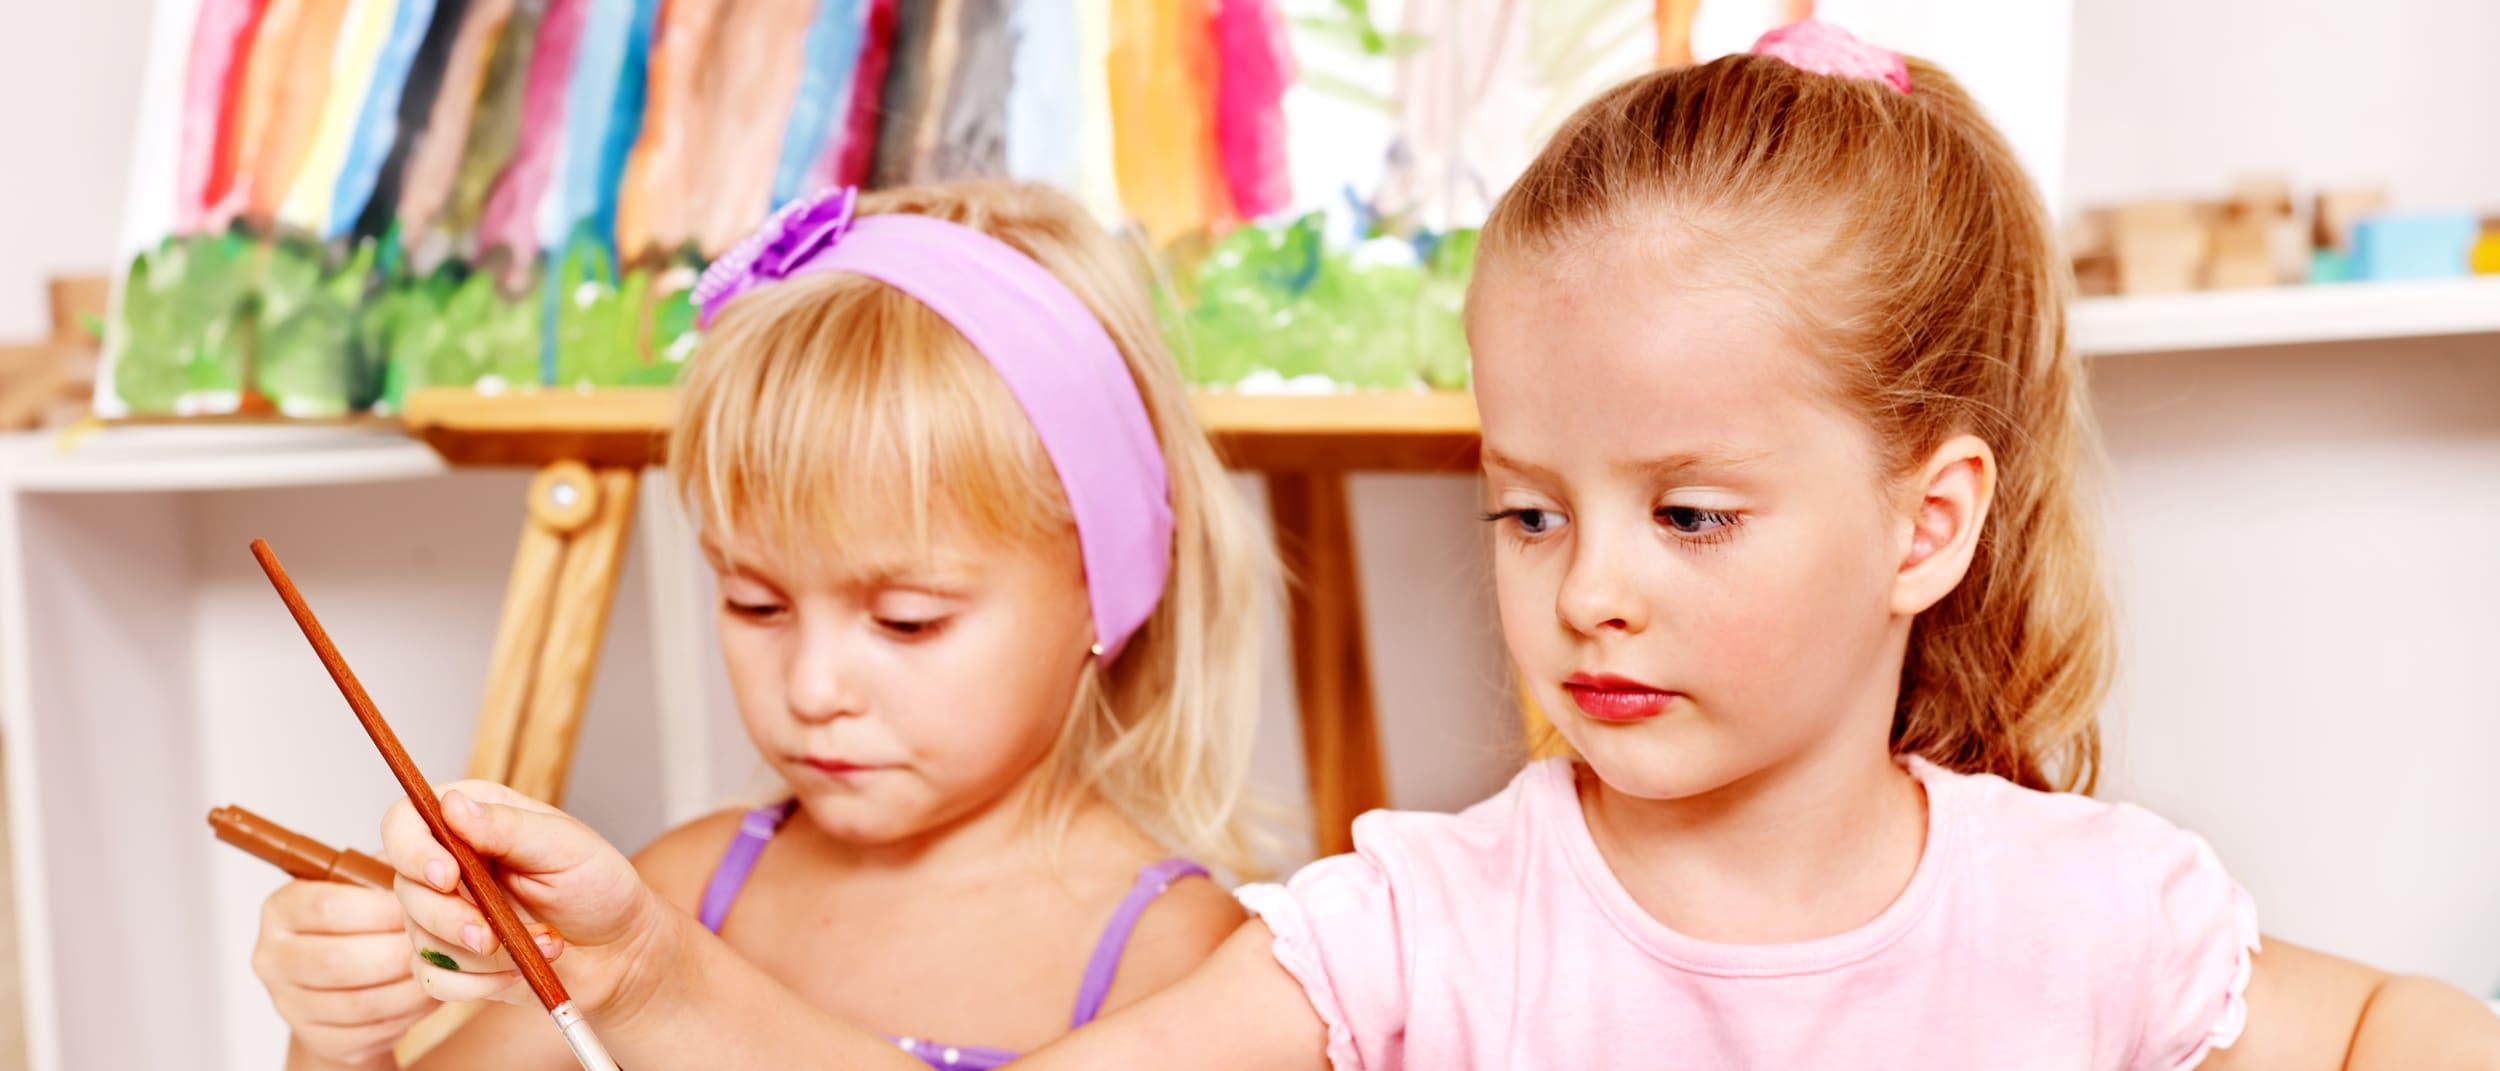 Free Kids Arts & Craft Activities